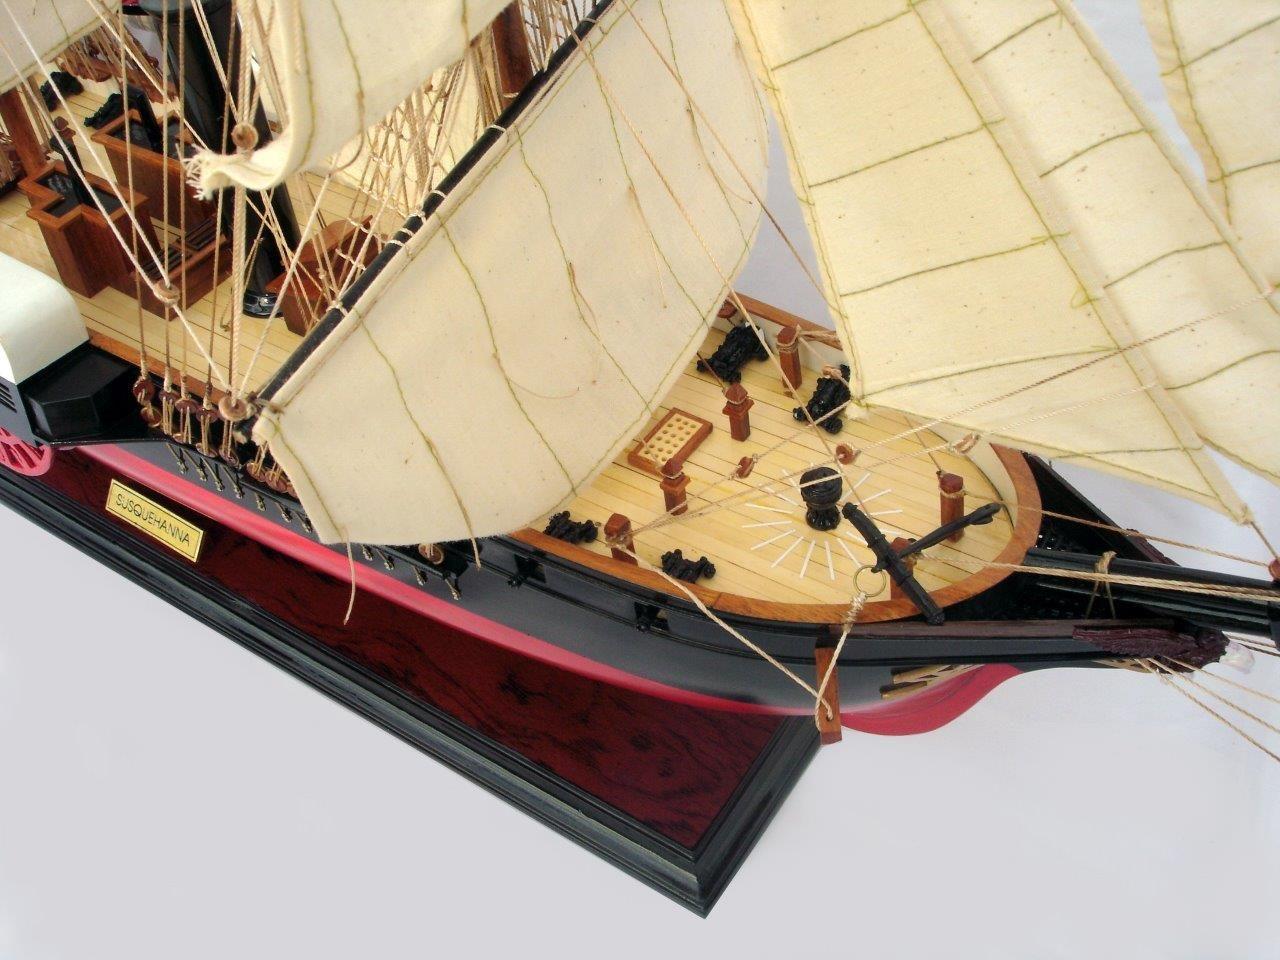 2098-12480-USS-Susquehanna-Model-Boat